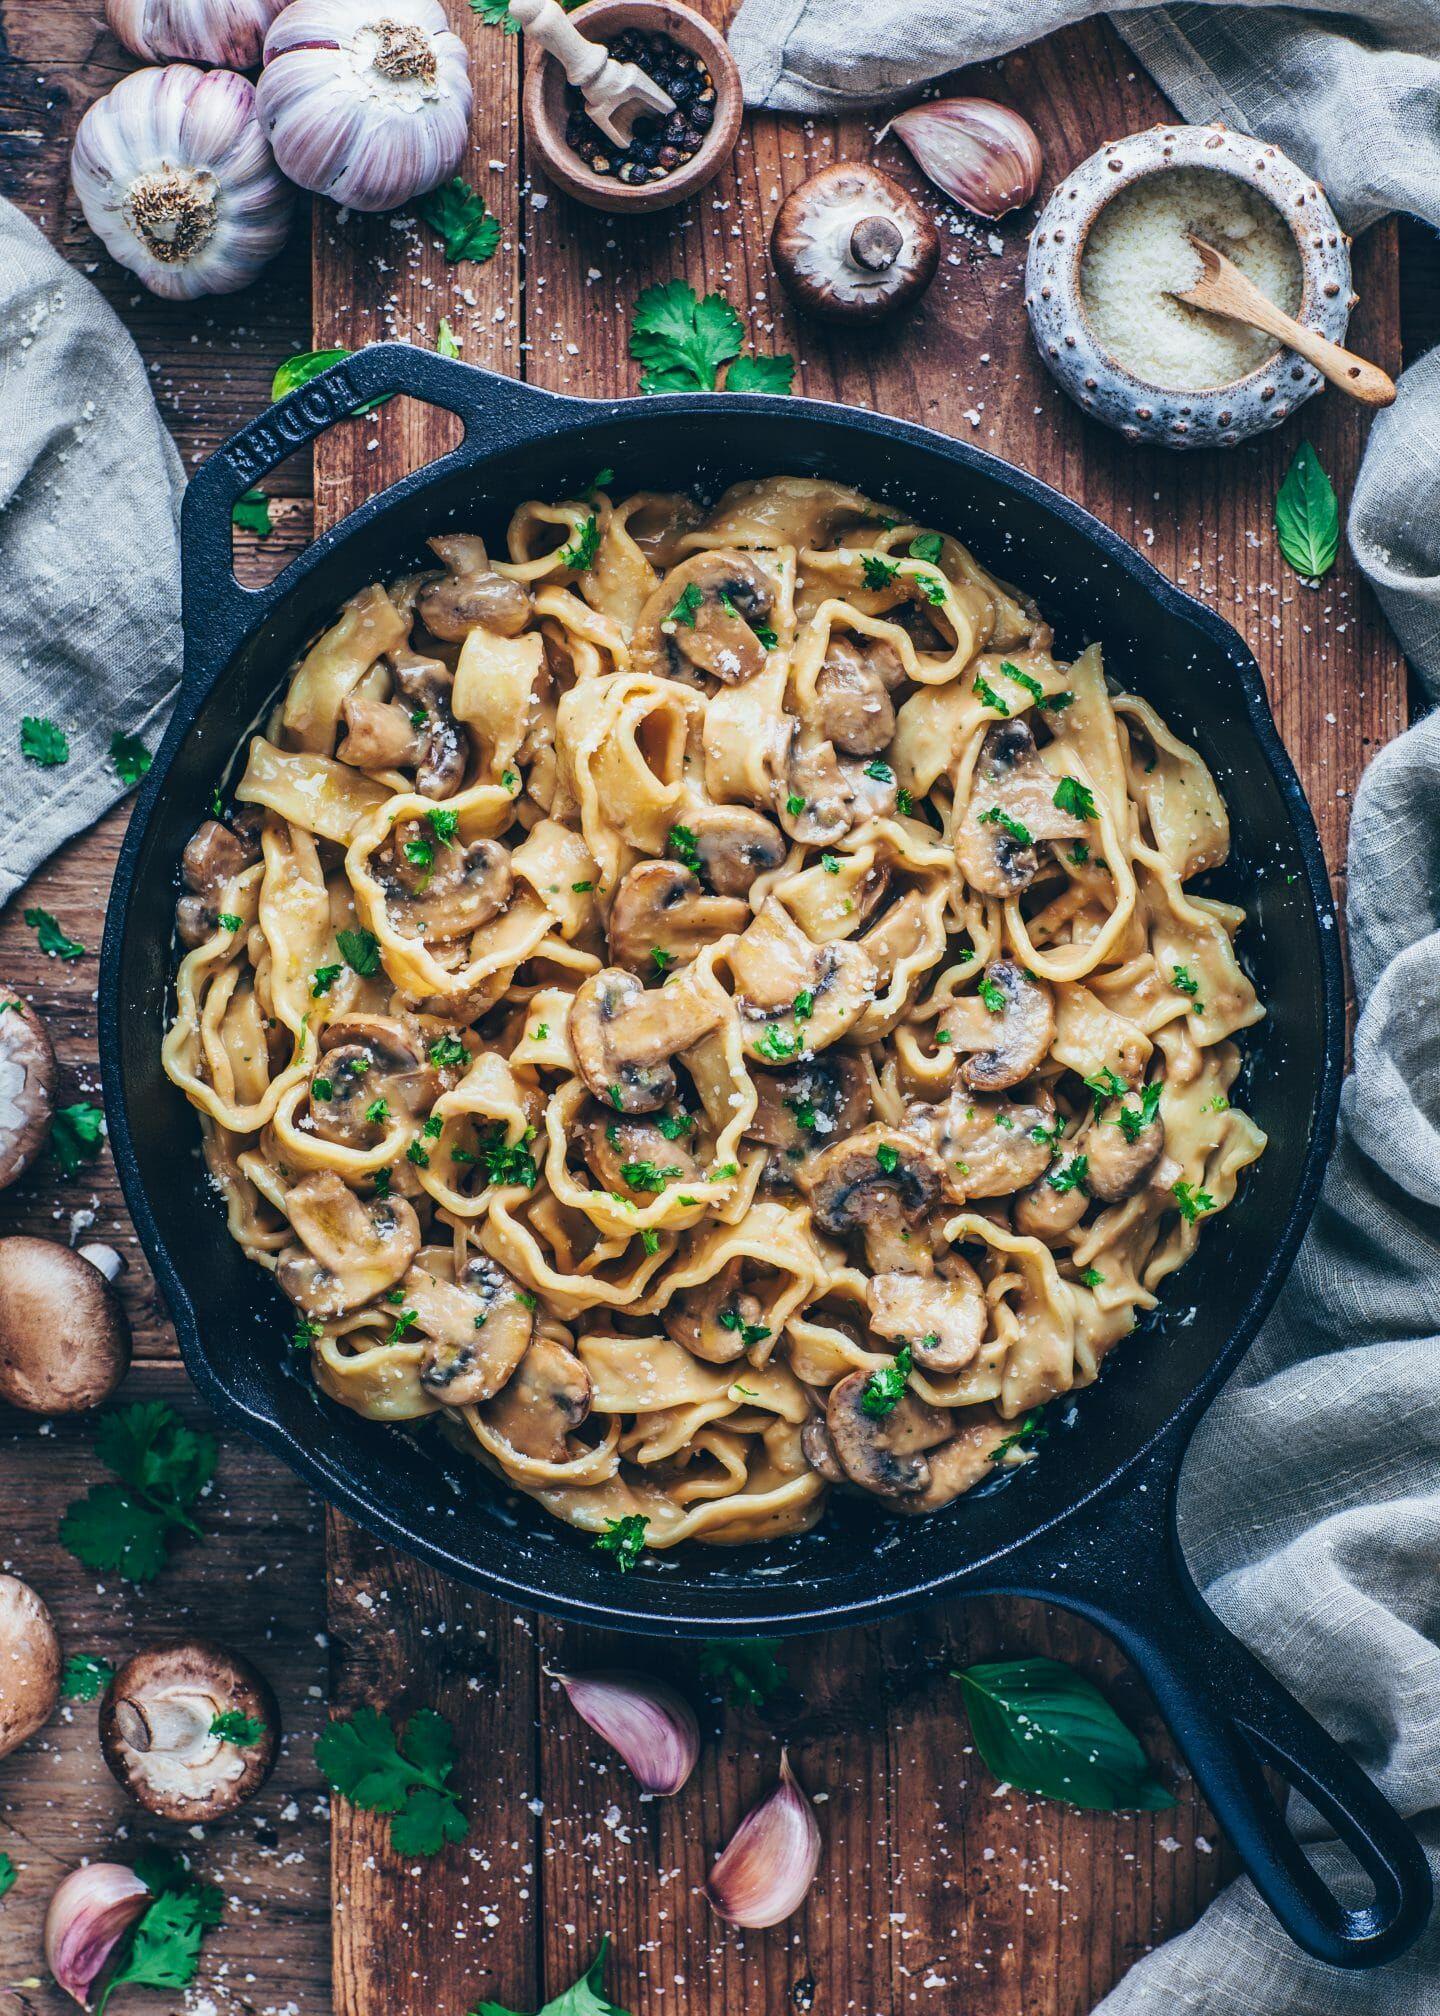 Photo of Cremige Champignon-Sauce mit Pasta | Stroganoff – Bianca Zapatka | Rezepte